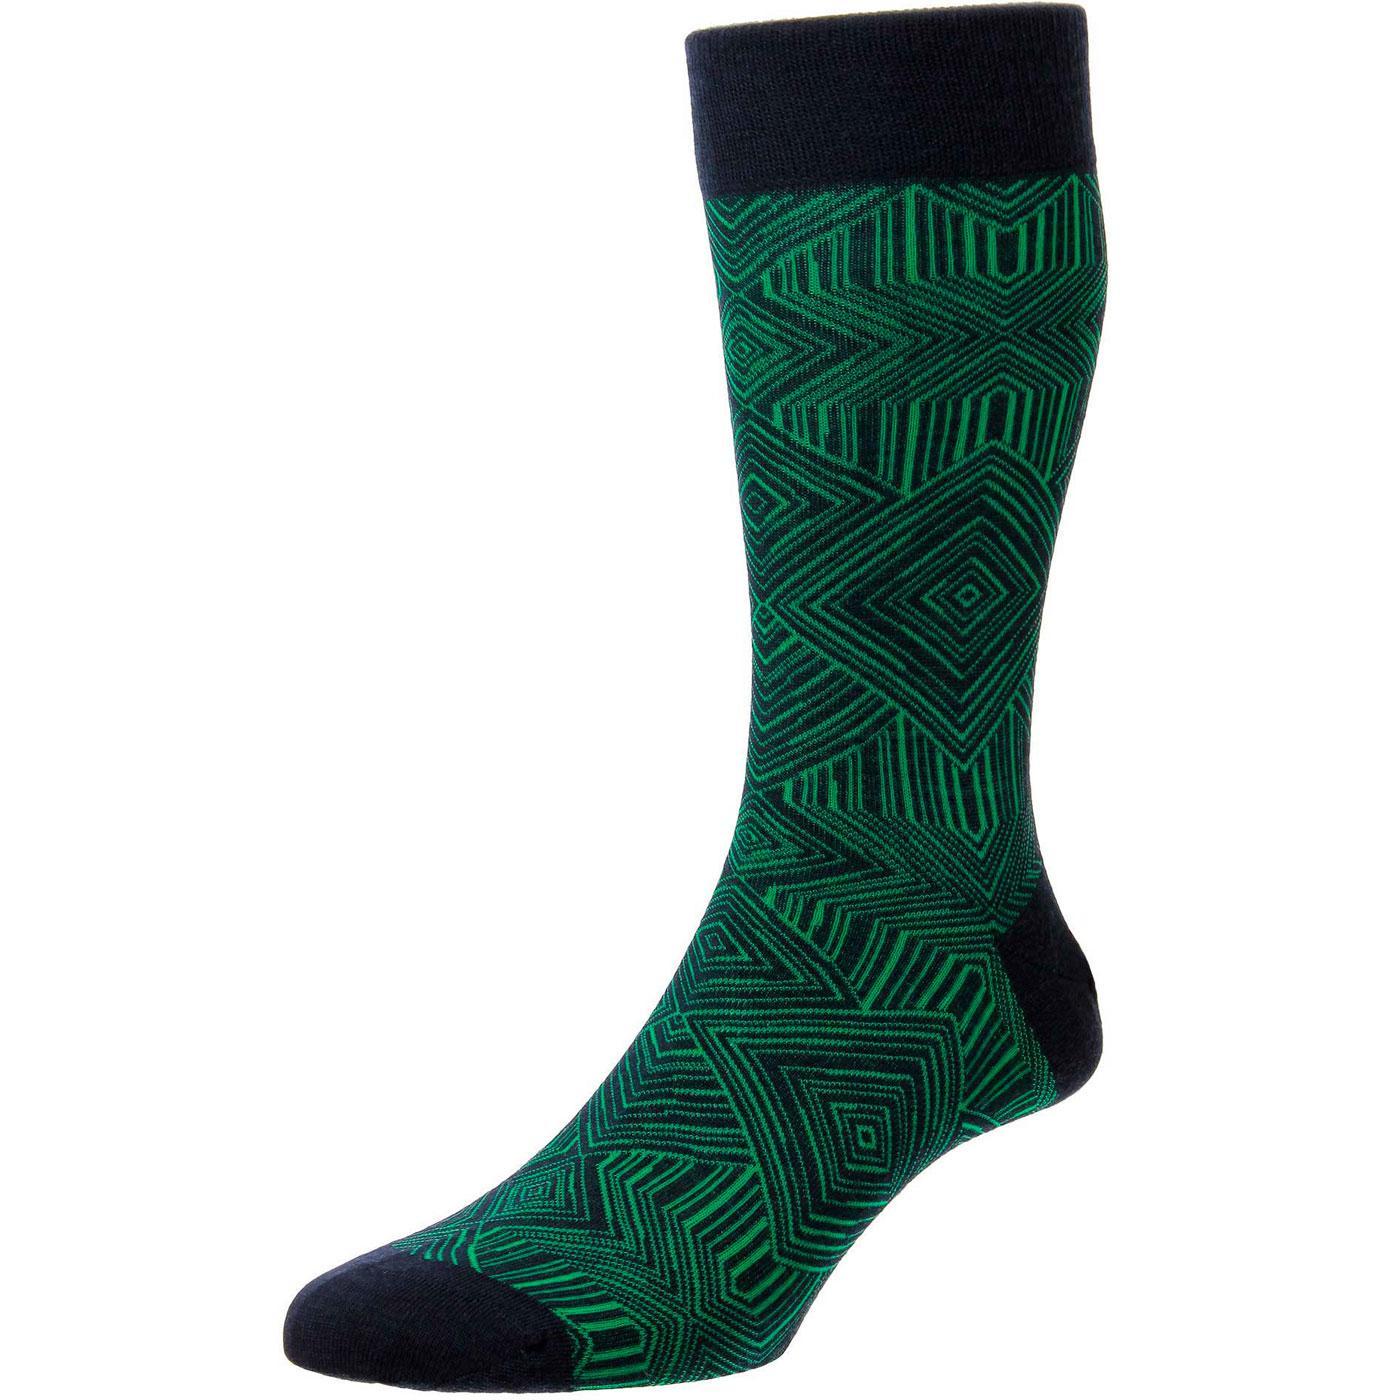 + Glaser PANTHERELLA Mod Made in England Socks N/G